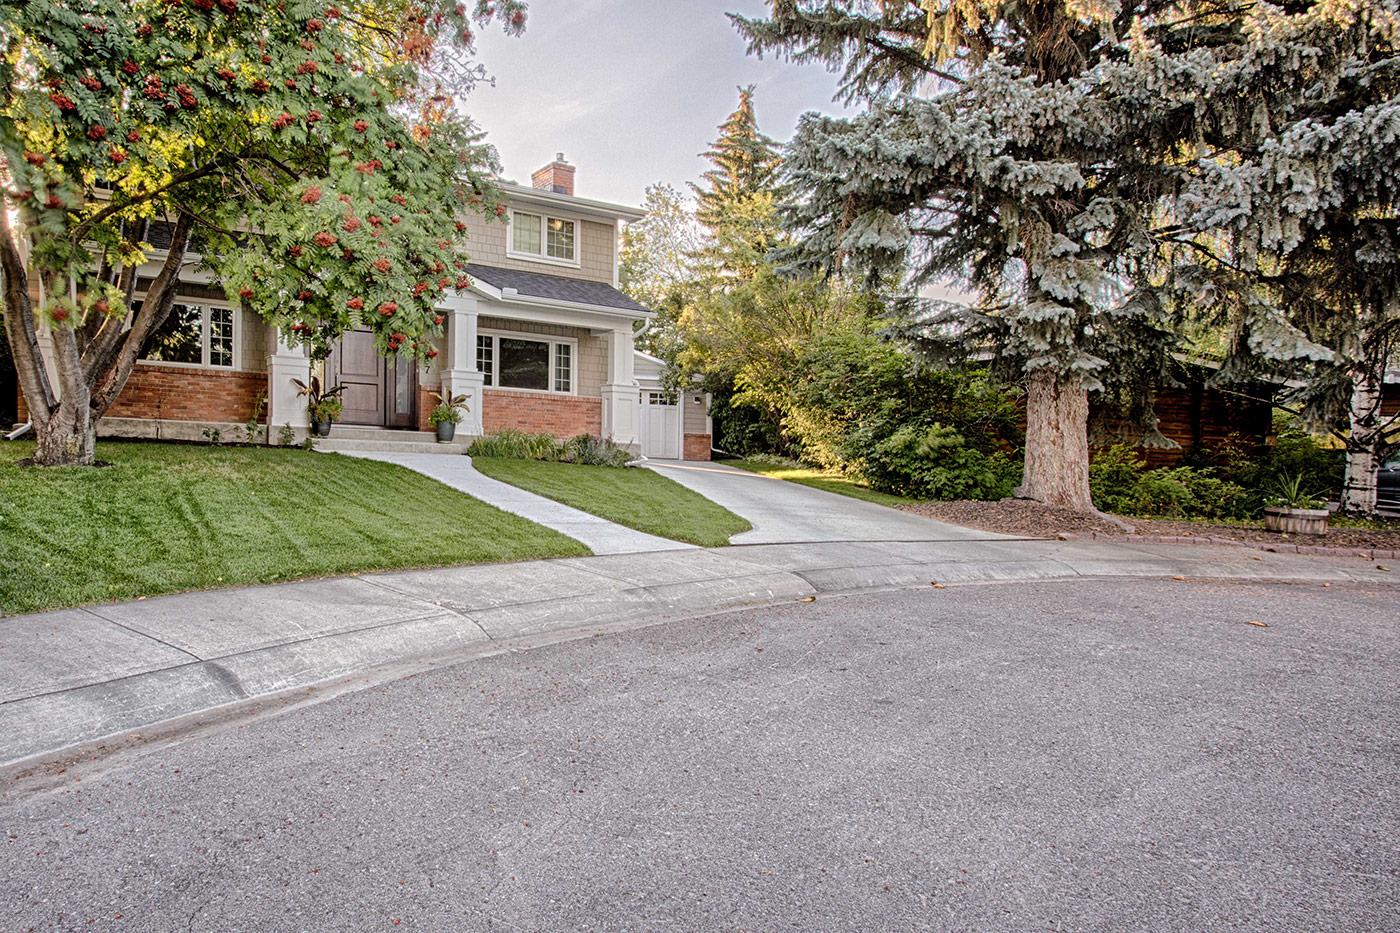 Exterior Renovations Calgary Home Makeovers Dependable Renos